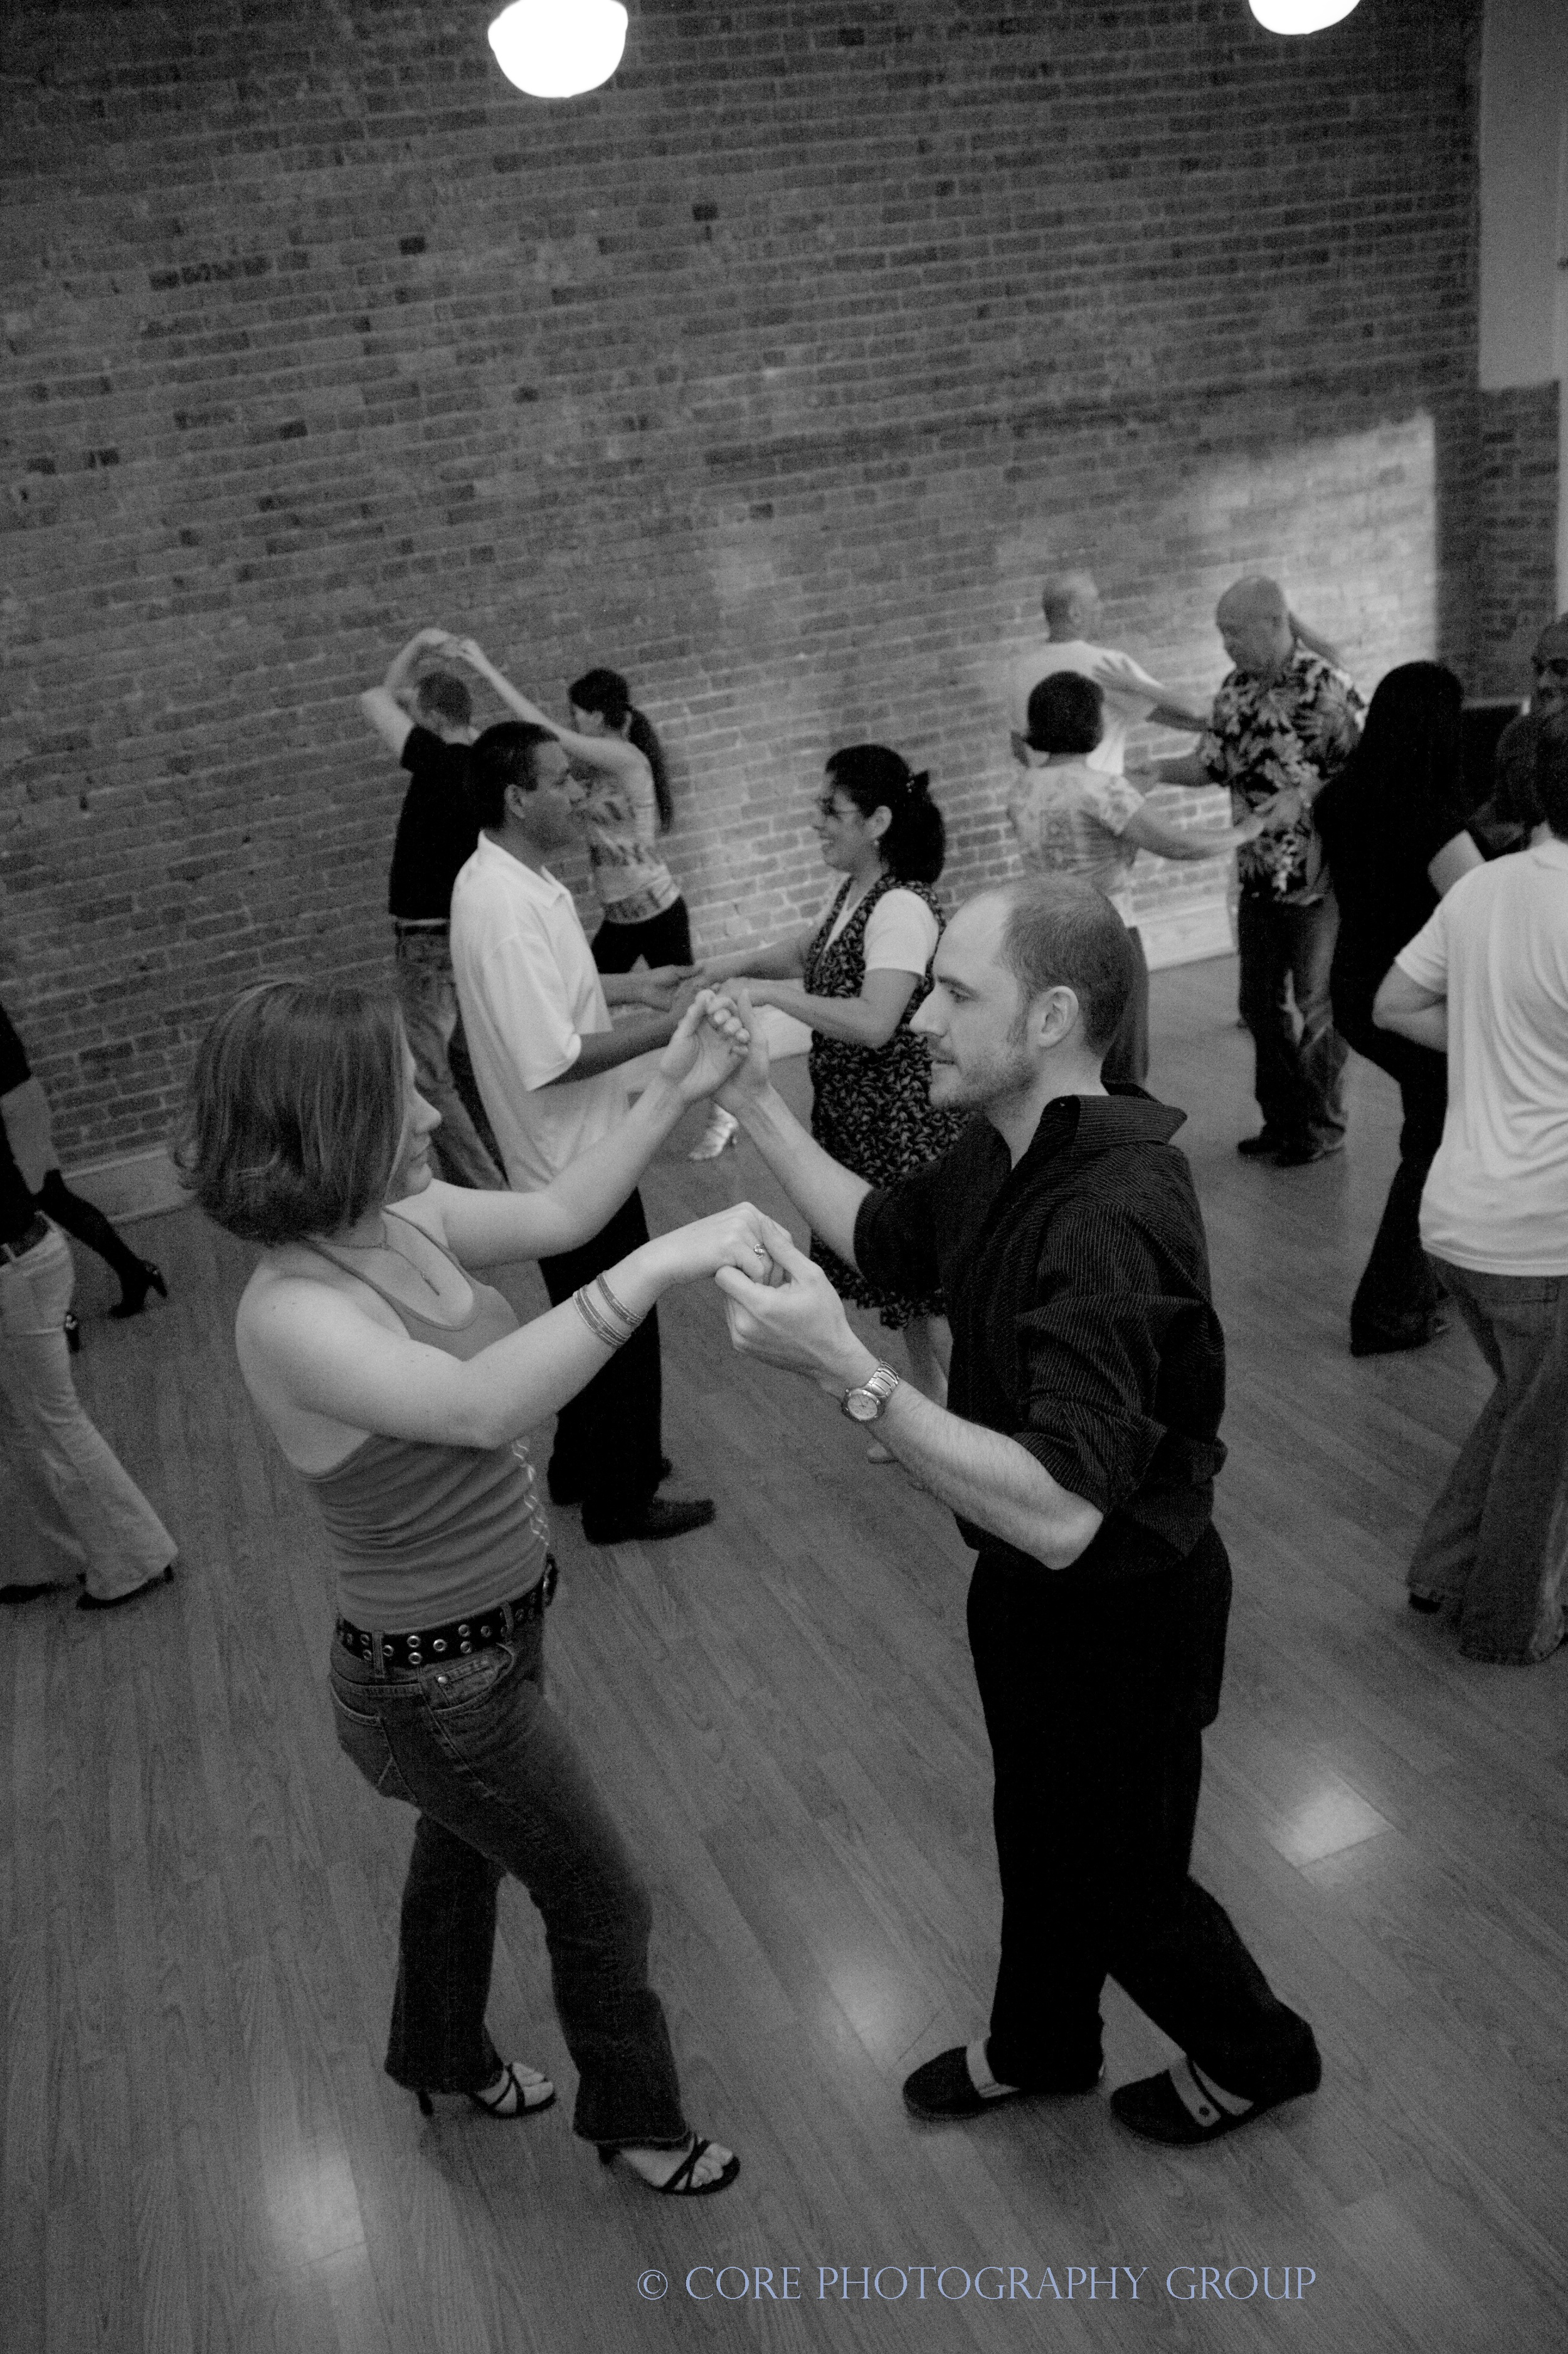 09-0515 salsa 203 of 300.jpg